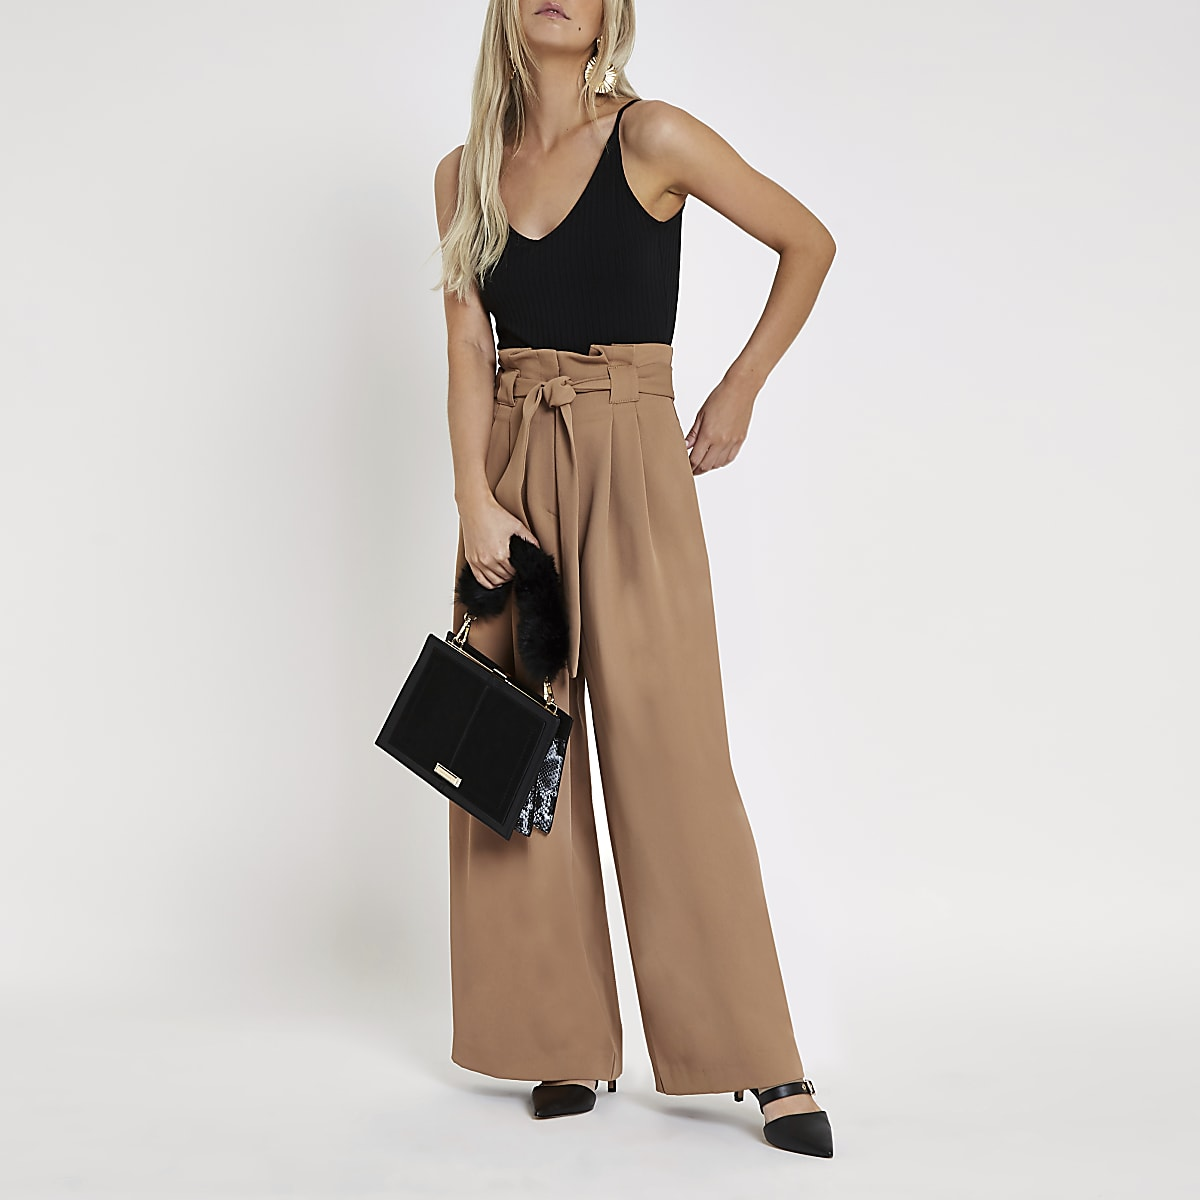 699c59242cbfdd Petite beige paperbag waist wide leg trousers - Wide Leg Trousers - Trousers  - women